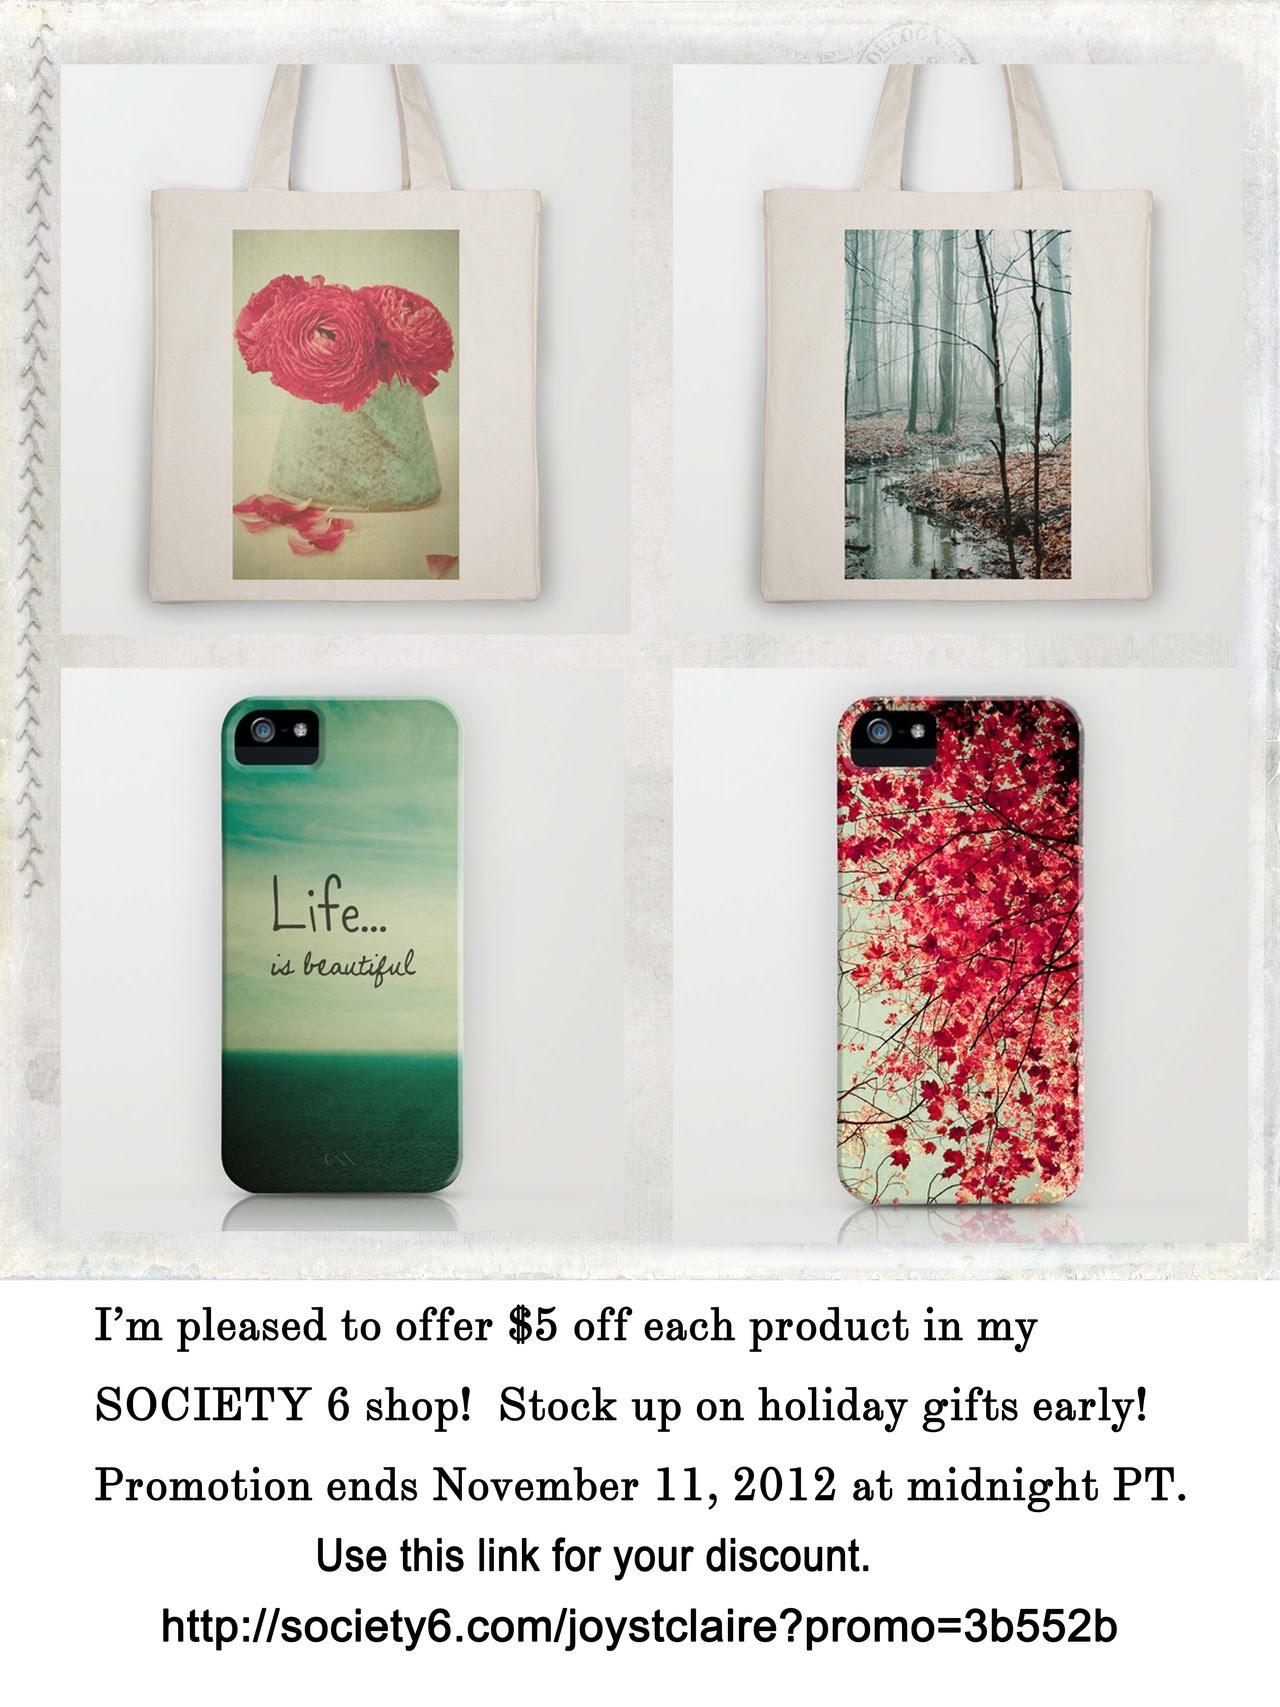 mashababko: I Love Wallpaper Discount Code